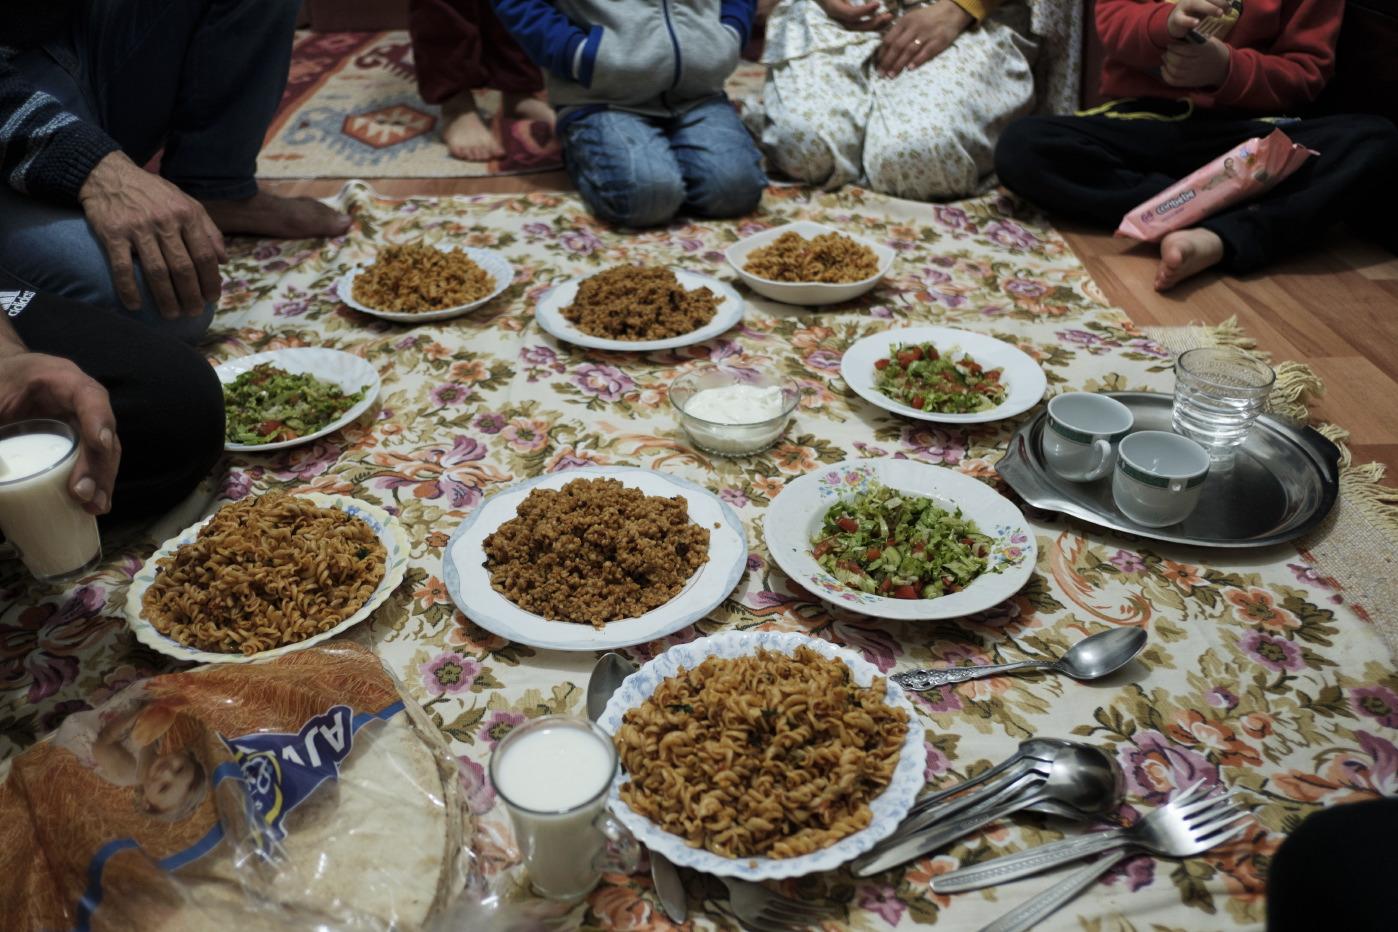 Dinner time at the Shehabi home. Istanbul, Turkey 2016. © Matteo Bastianelli